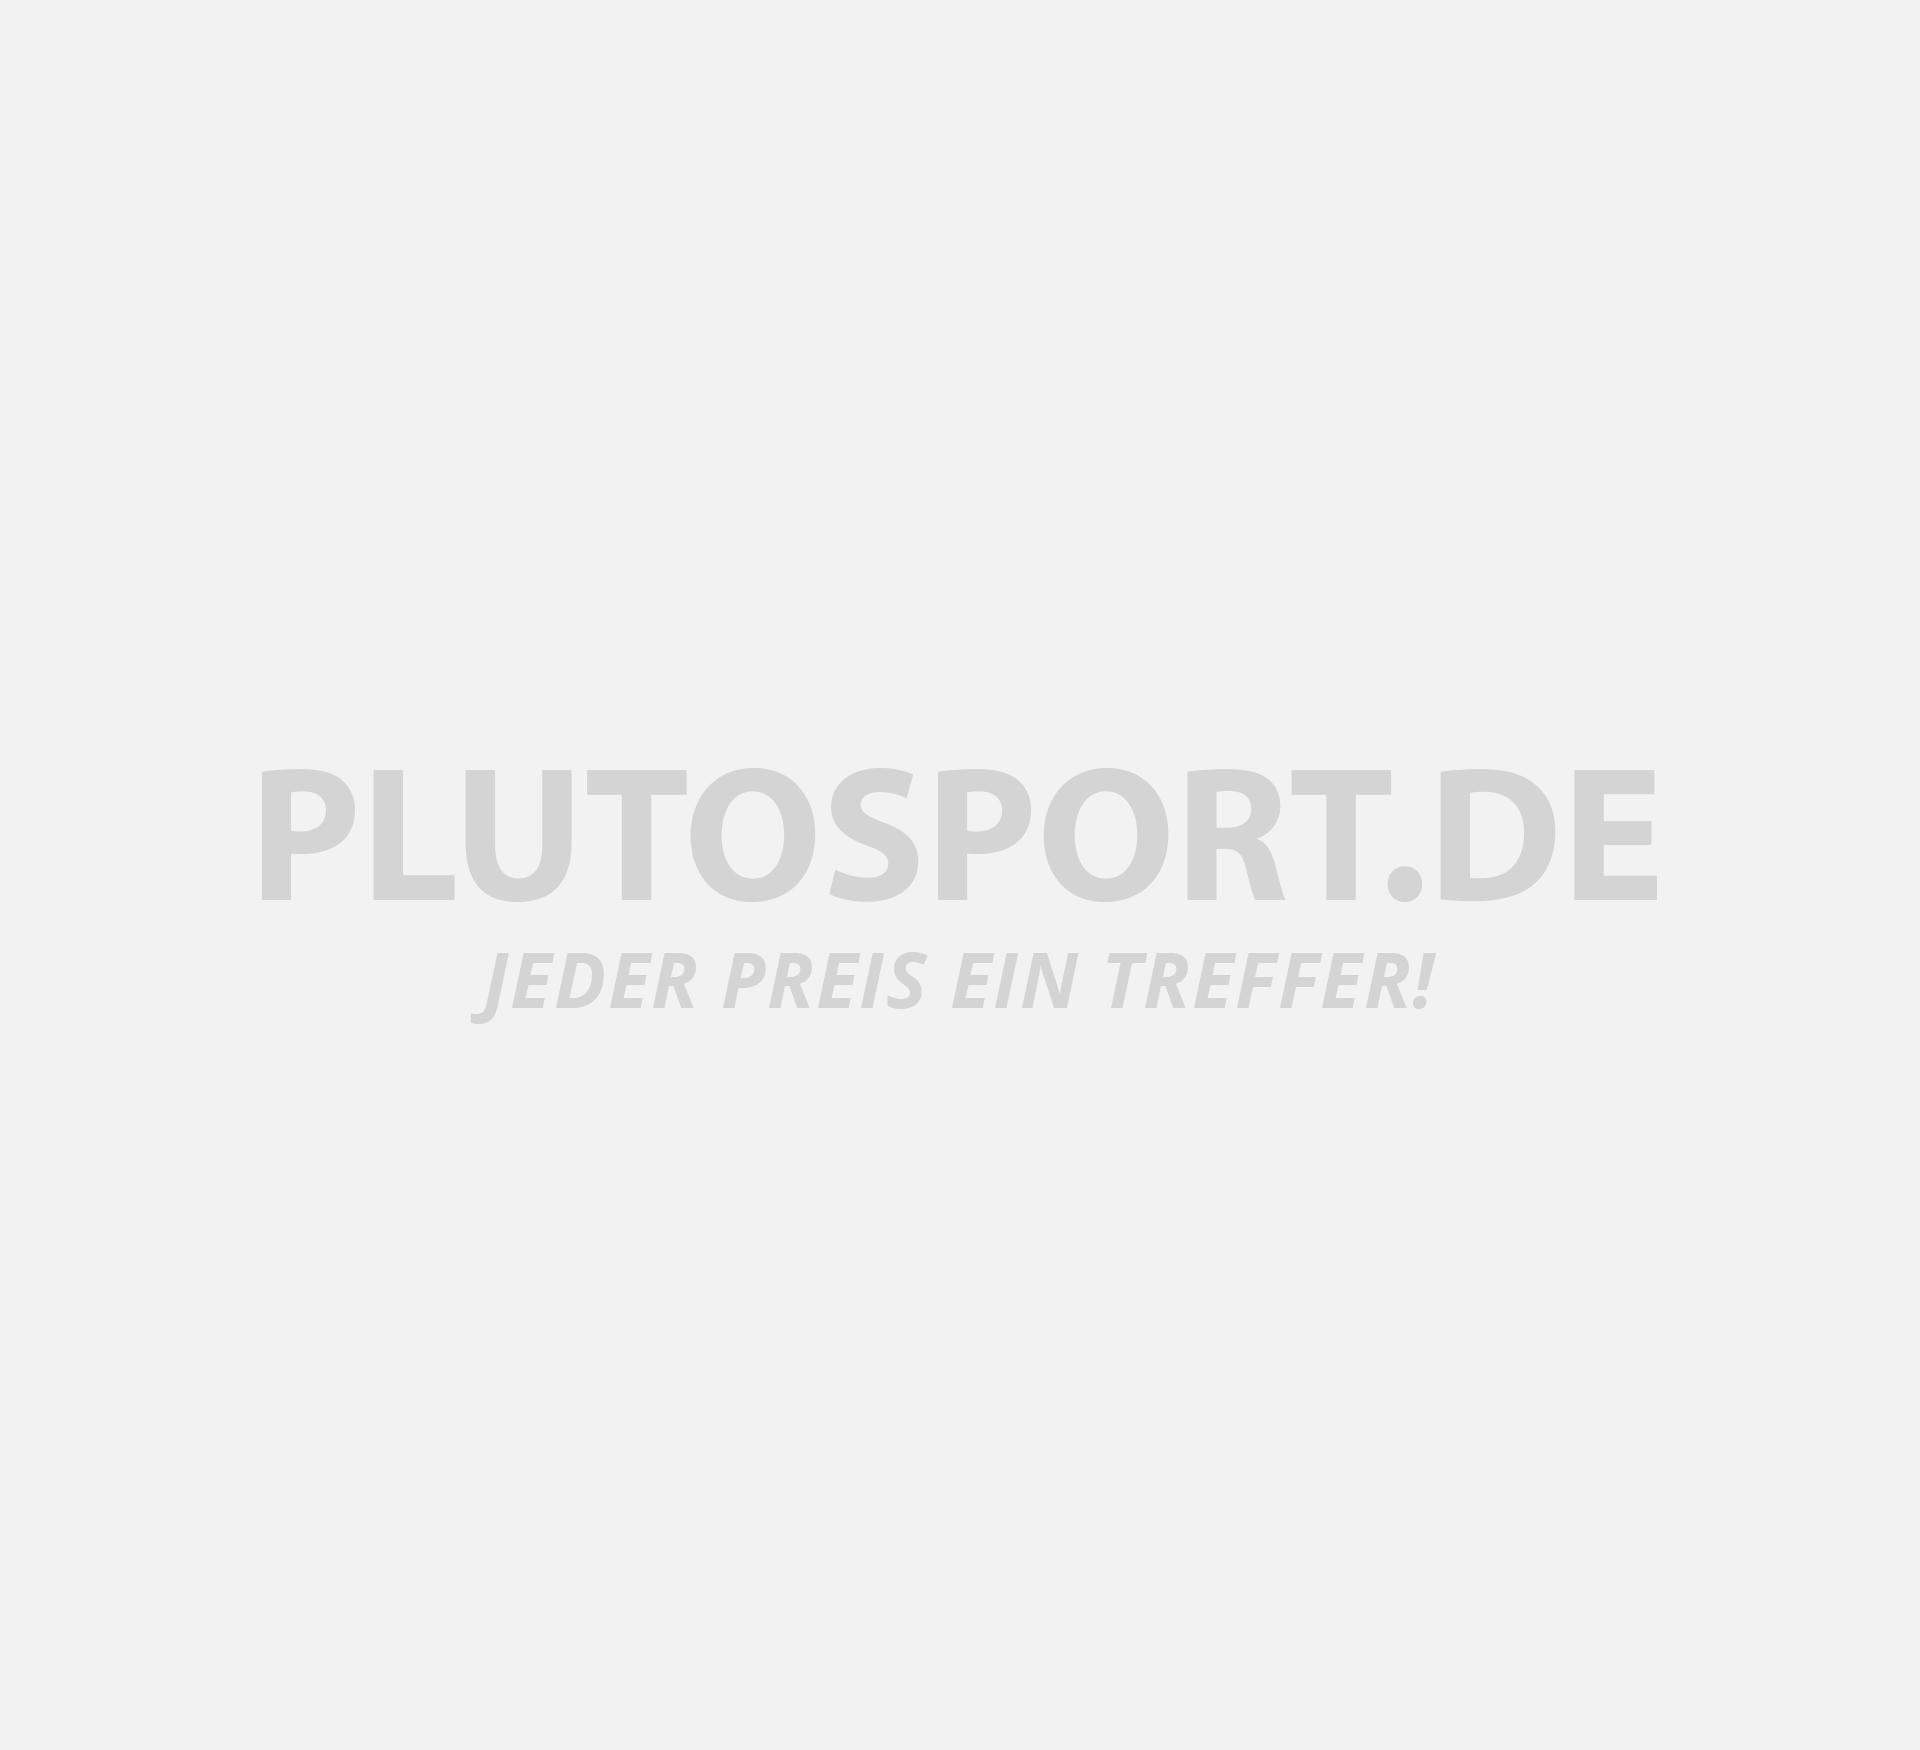 Aqua Lung Sport Cozumel Seabreeze Schnorchel Set Senior